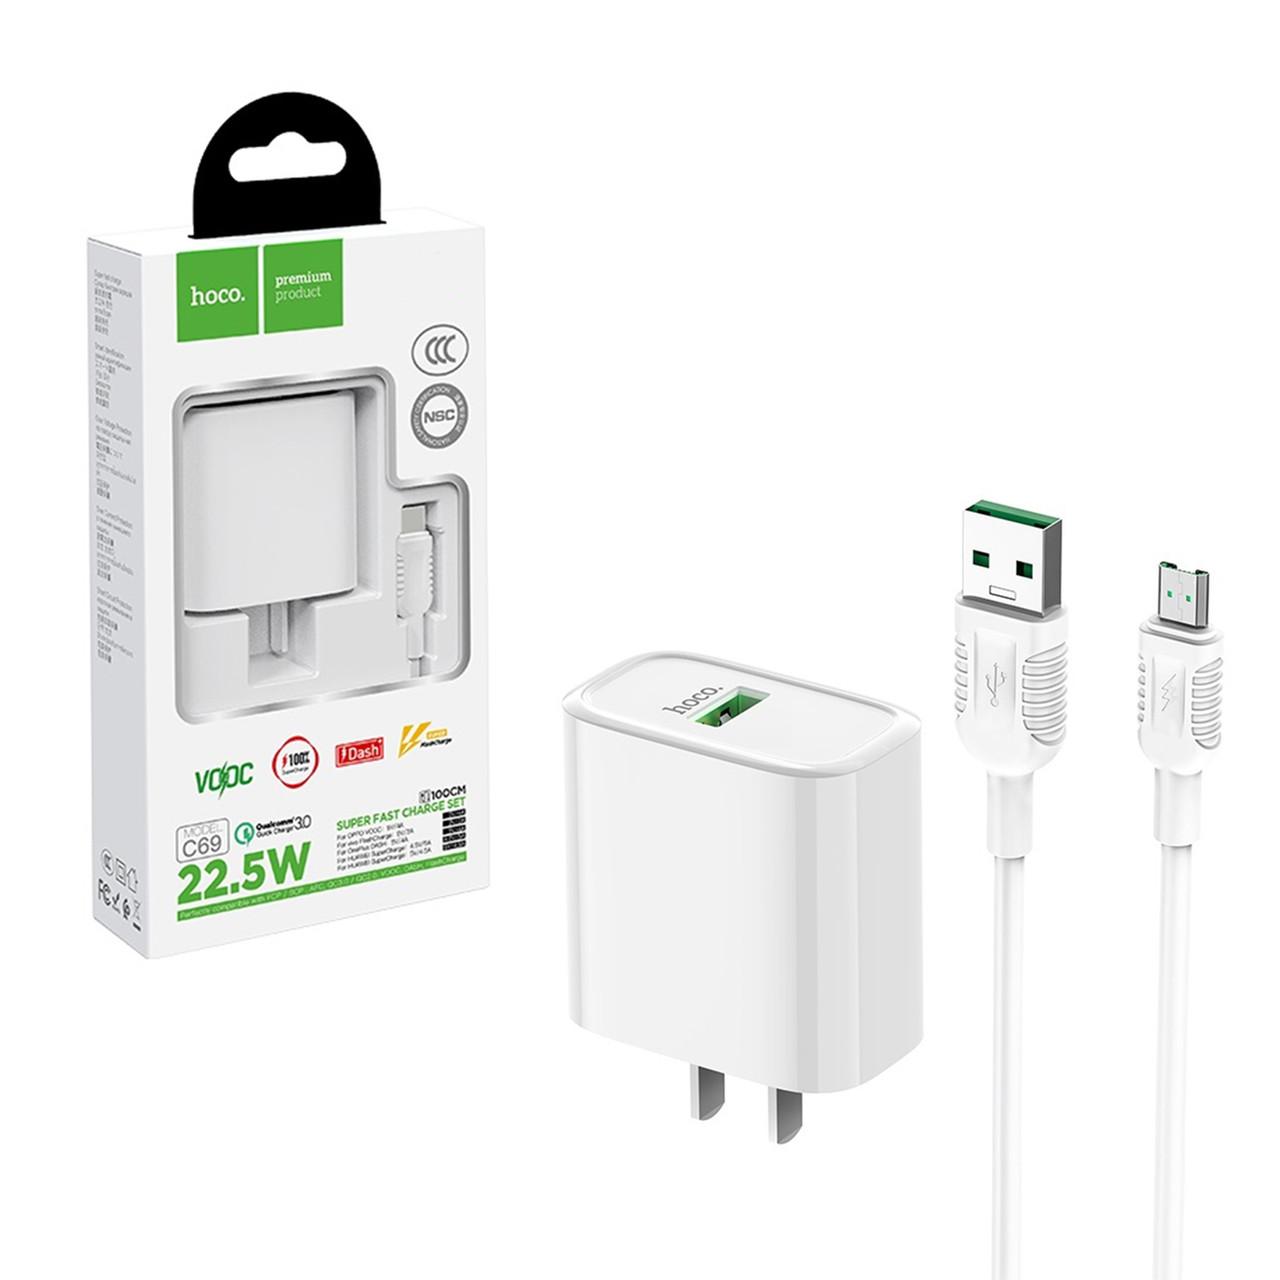 Сетевое зарядное устройство Hoco C69A + кабель Micro USB 1XUSB QC 3.0 22,5W,  White